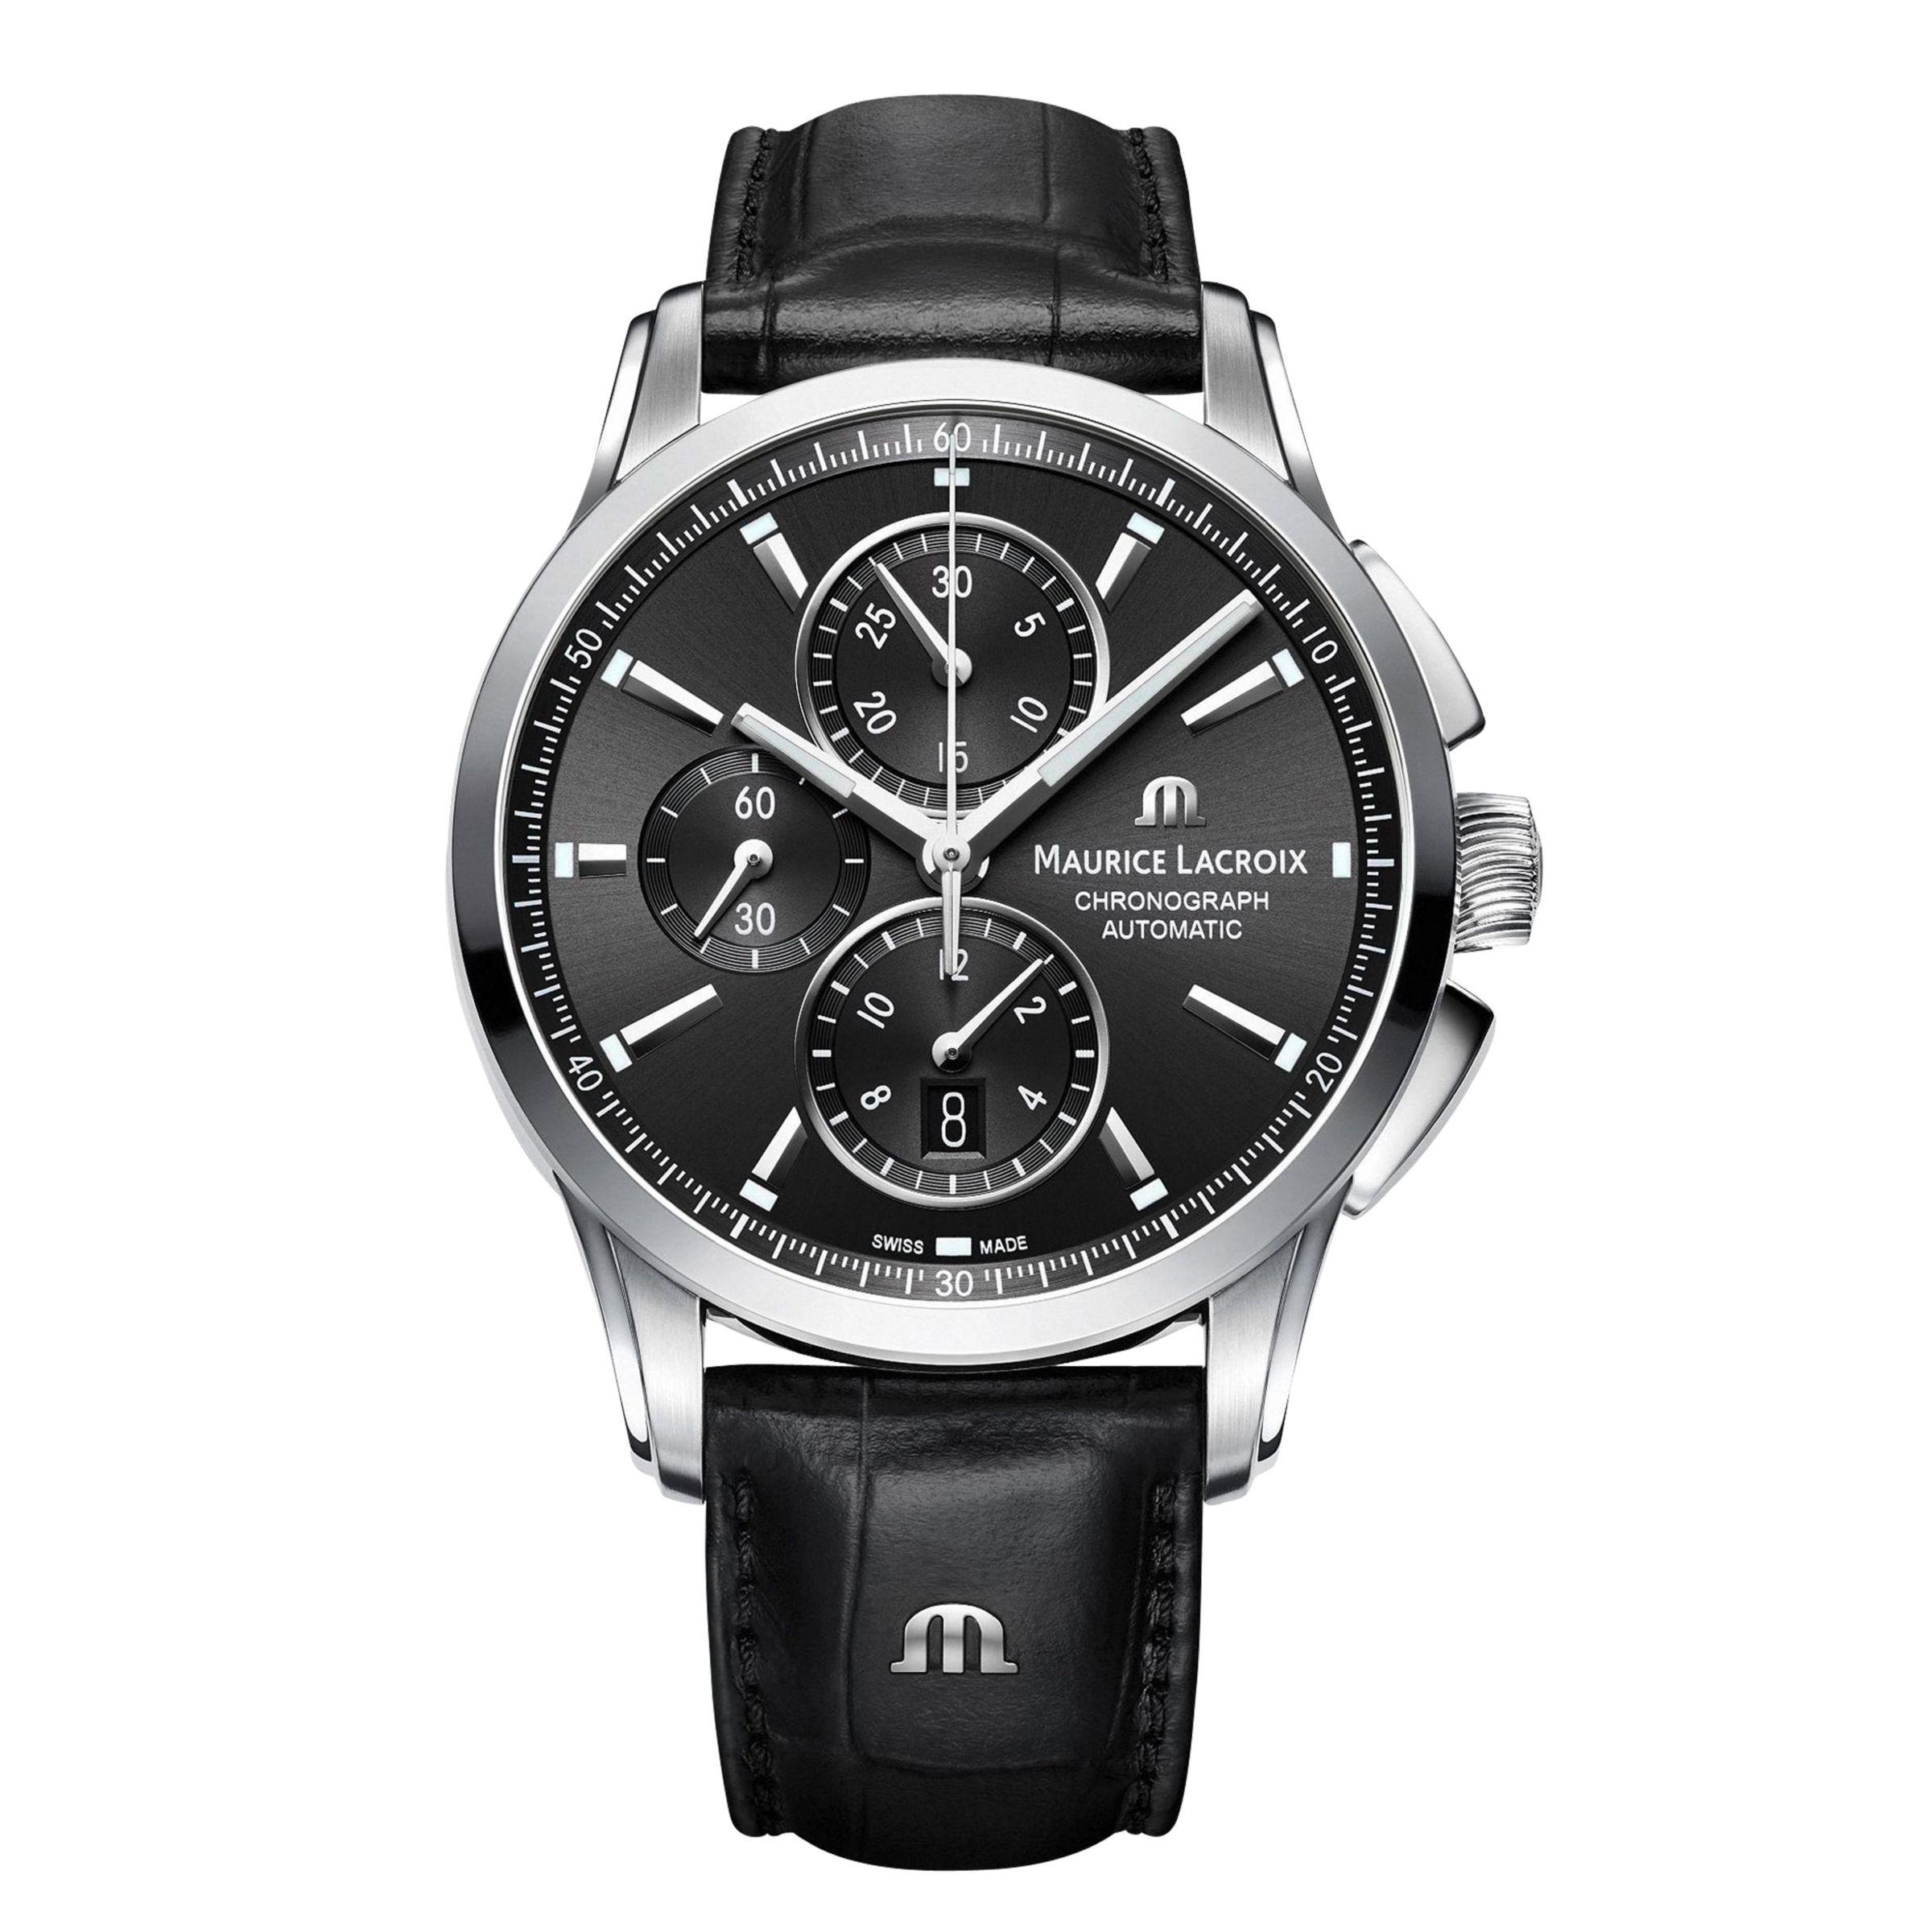 Maurice Lacroix Maurice Lacroix PT6388-SS001-330-1 Men's Pontos Chronograph Date Automatic Leather Strap Watch, Black